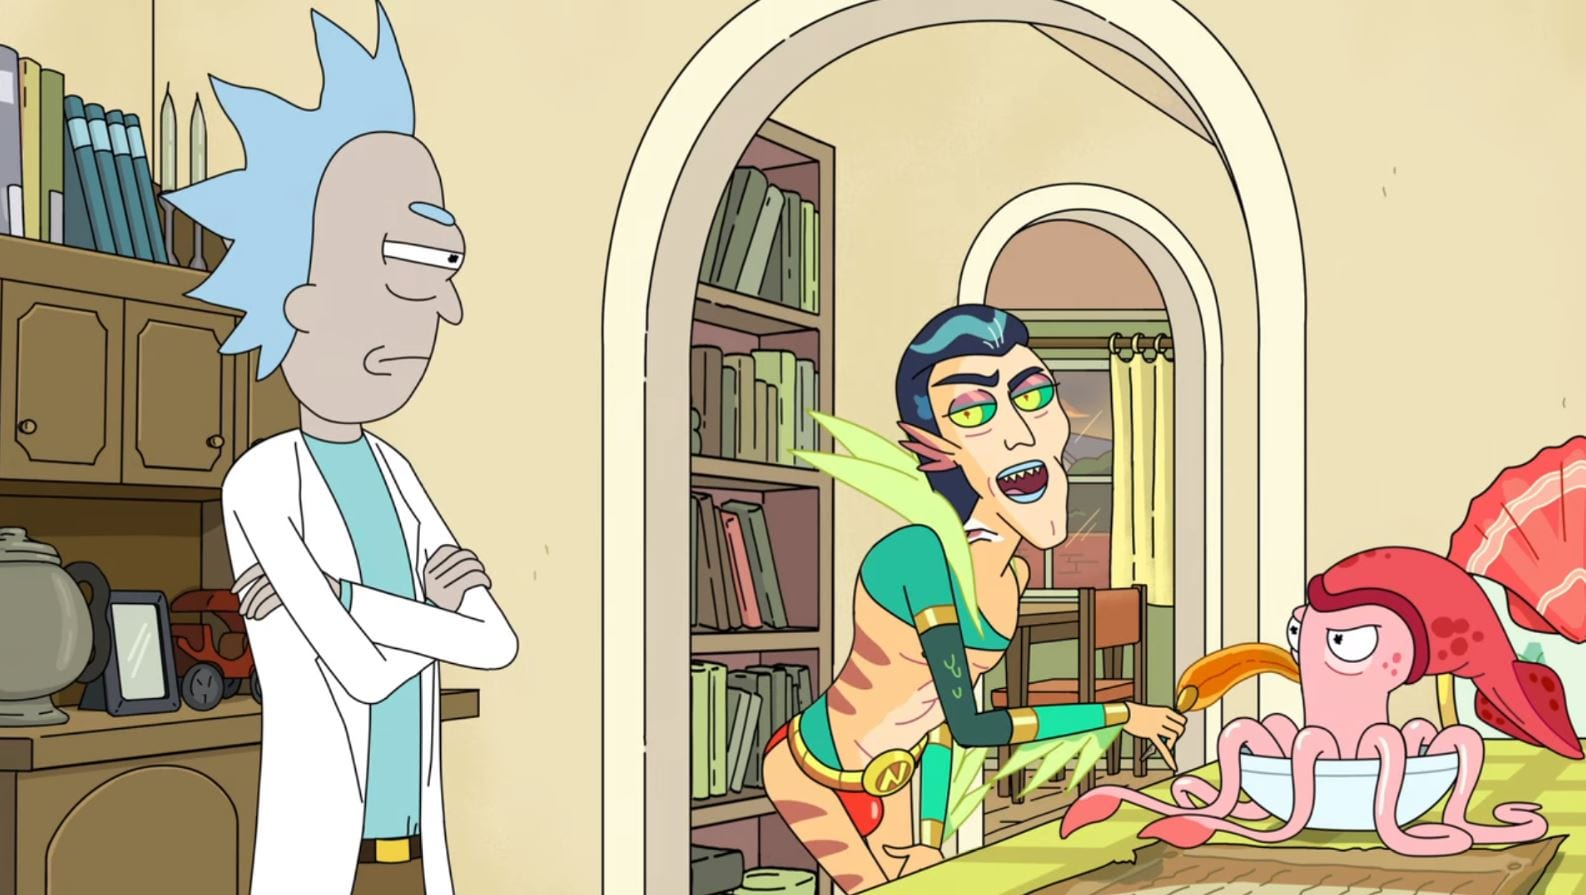 Rick and Morty Season 5 Episode 1 Ending Explained